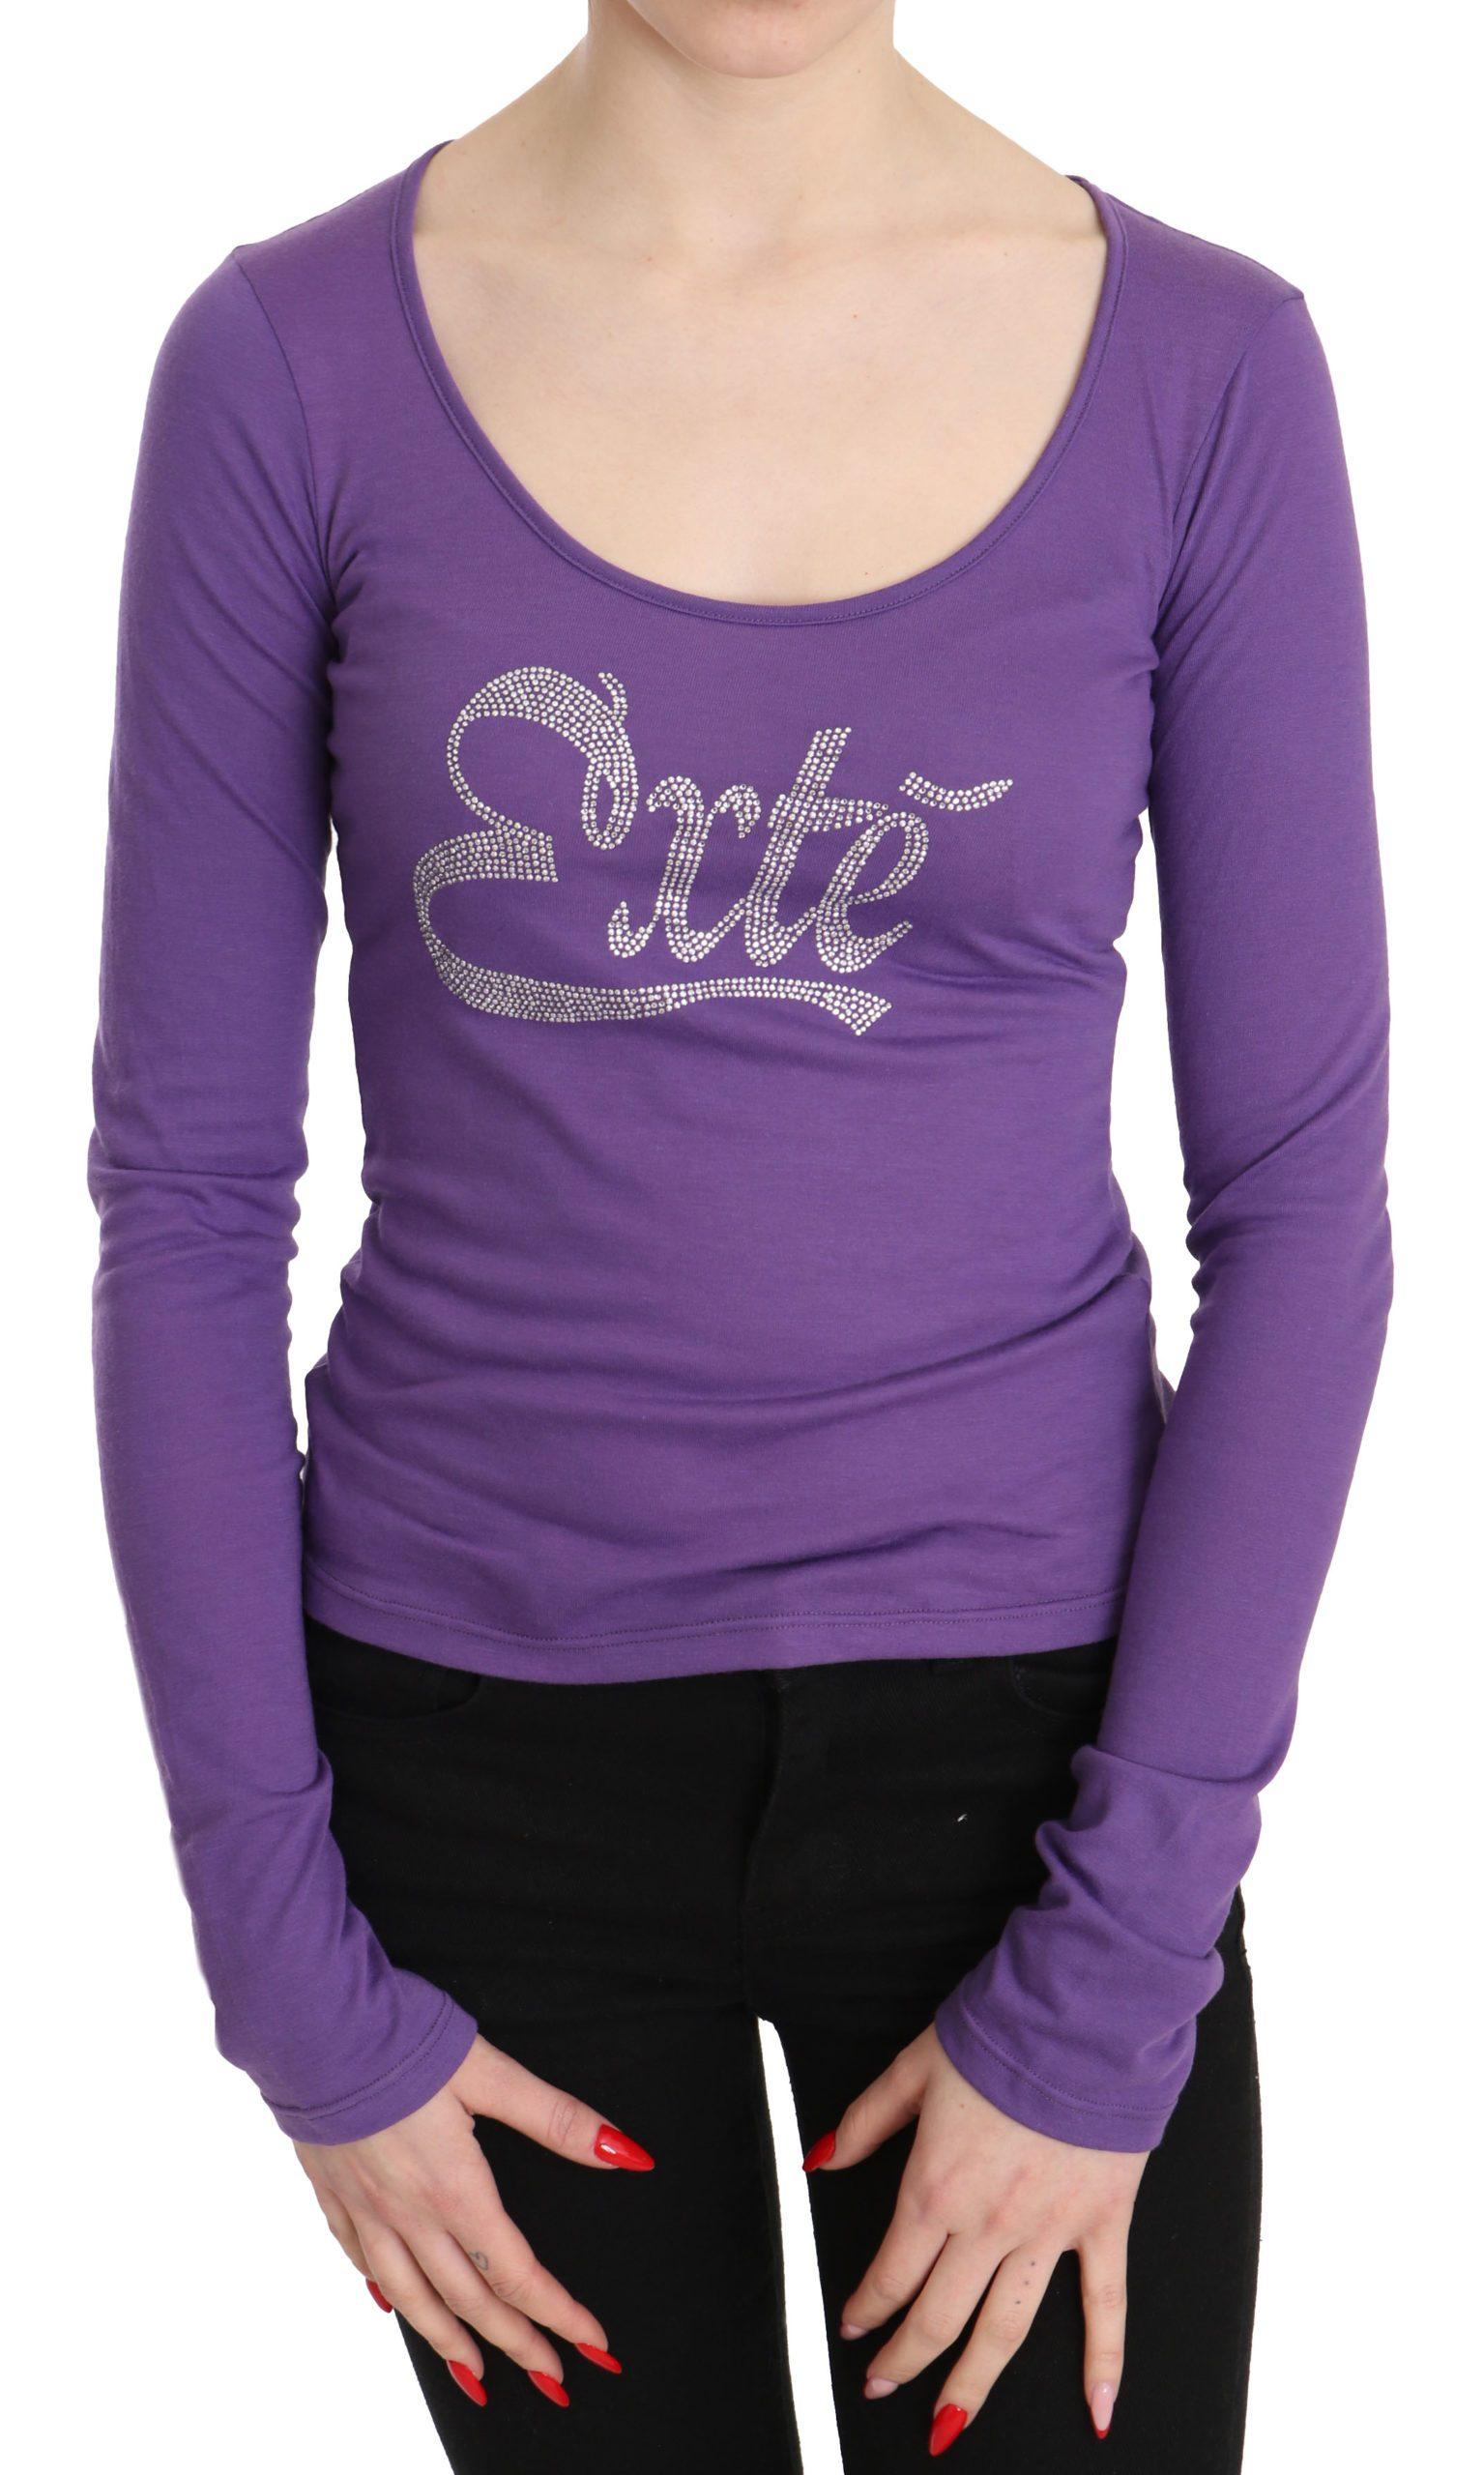 Exte Women's Exte Crystal Embellished Long Sleeve Top Purple TSH3413 - IT40|S